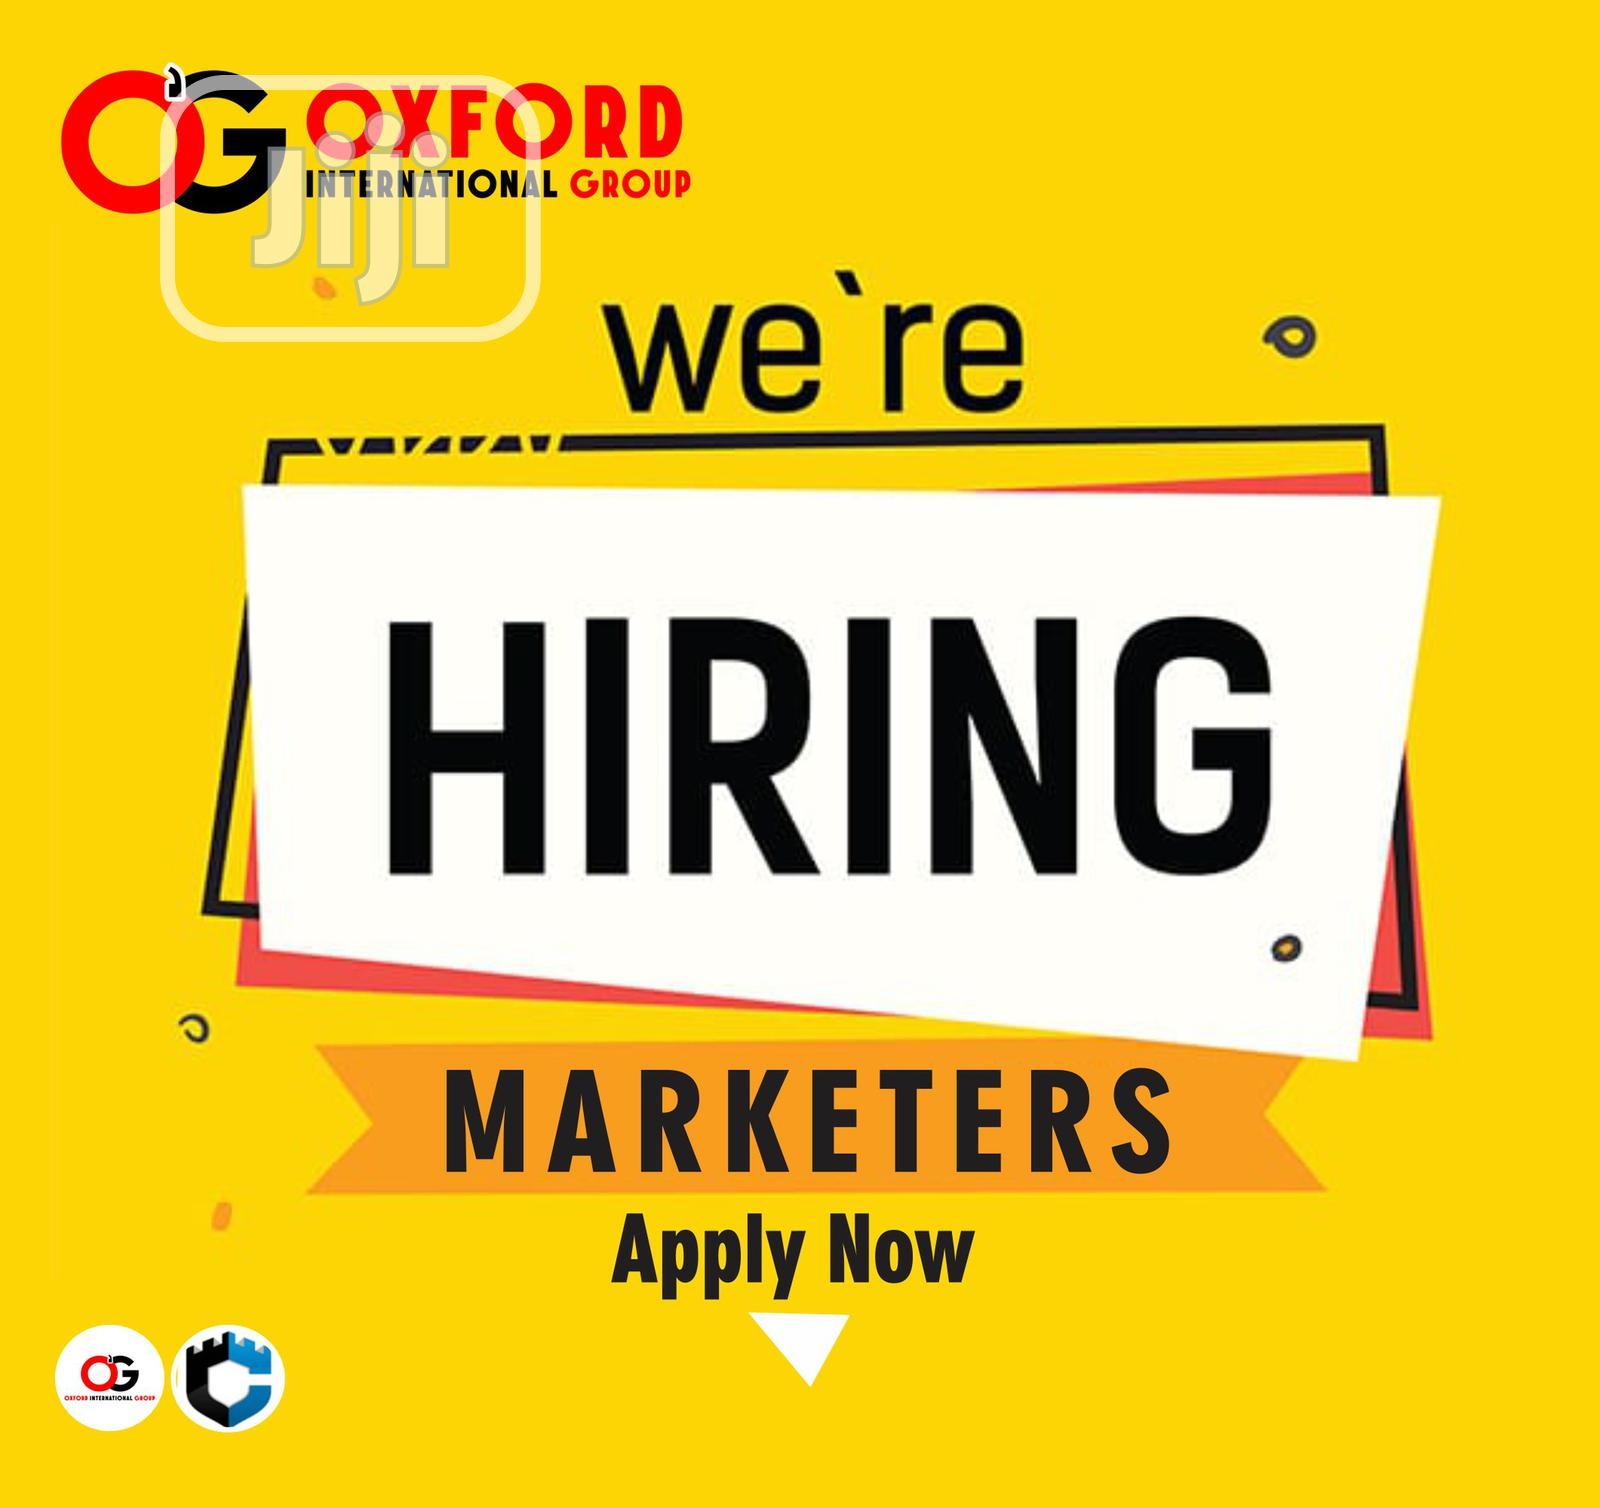 Sales / Marketing Executive Wanted